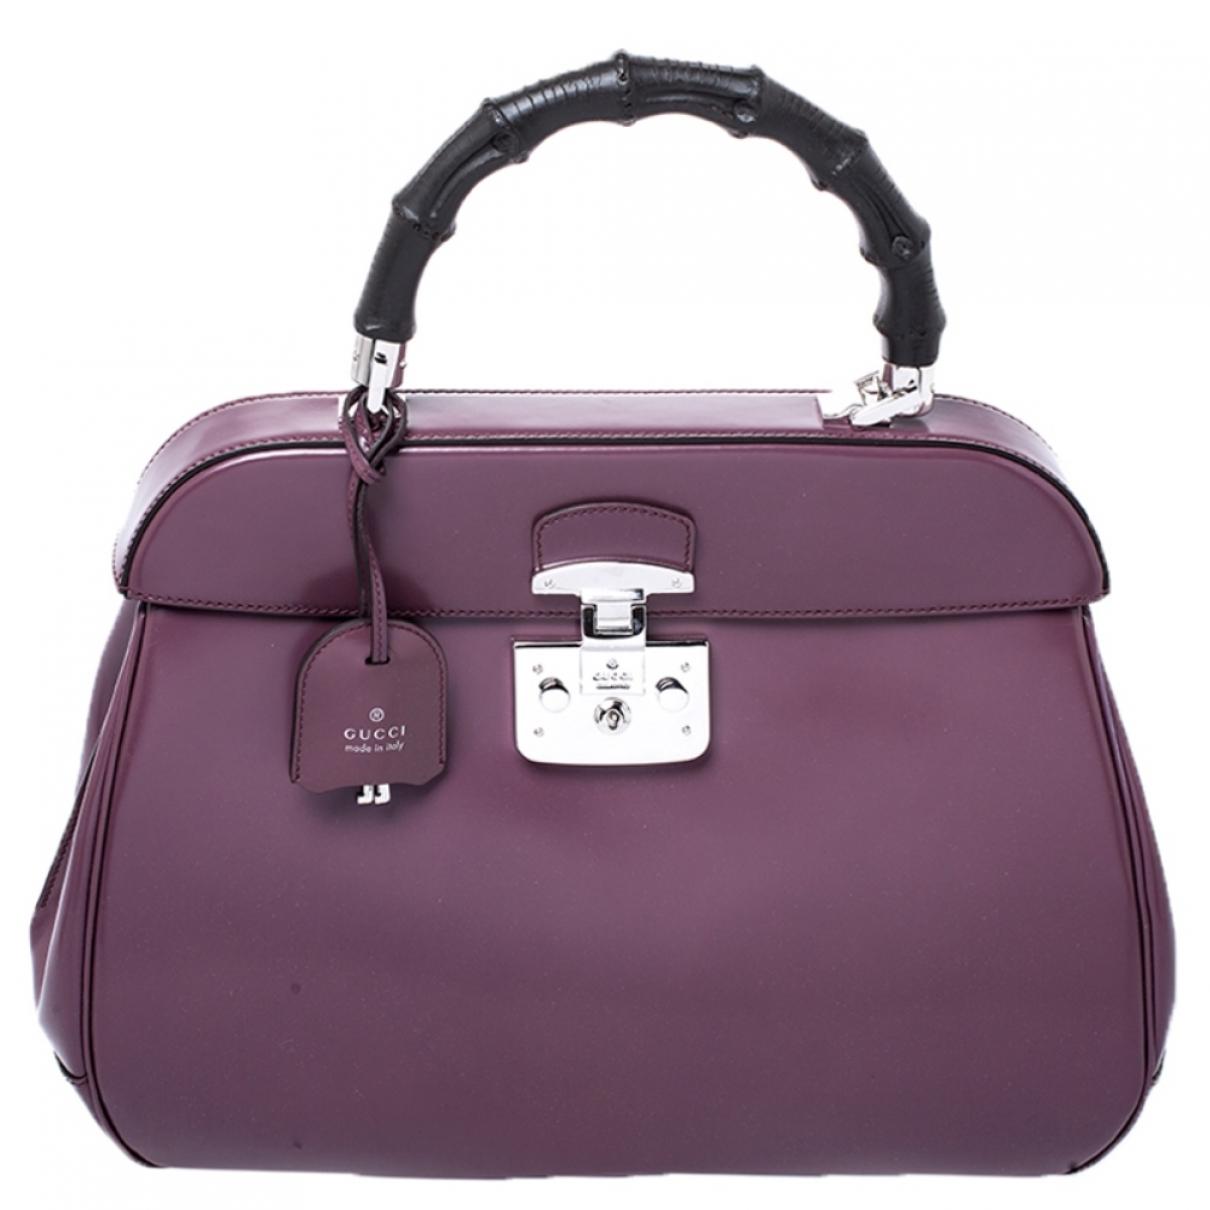 Gucci Lady Lock Handtasche in  Lila Leder